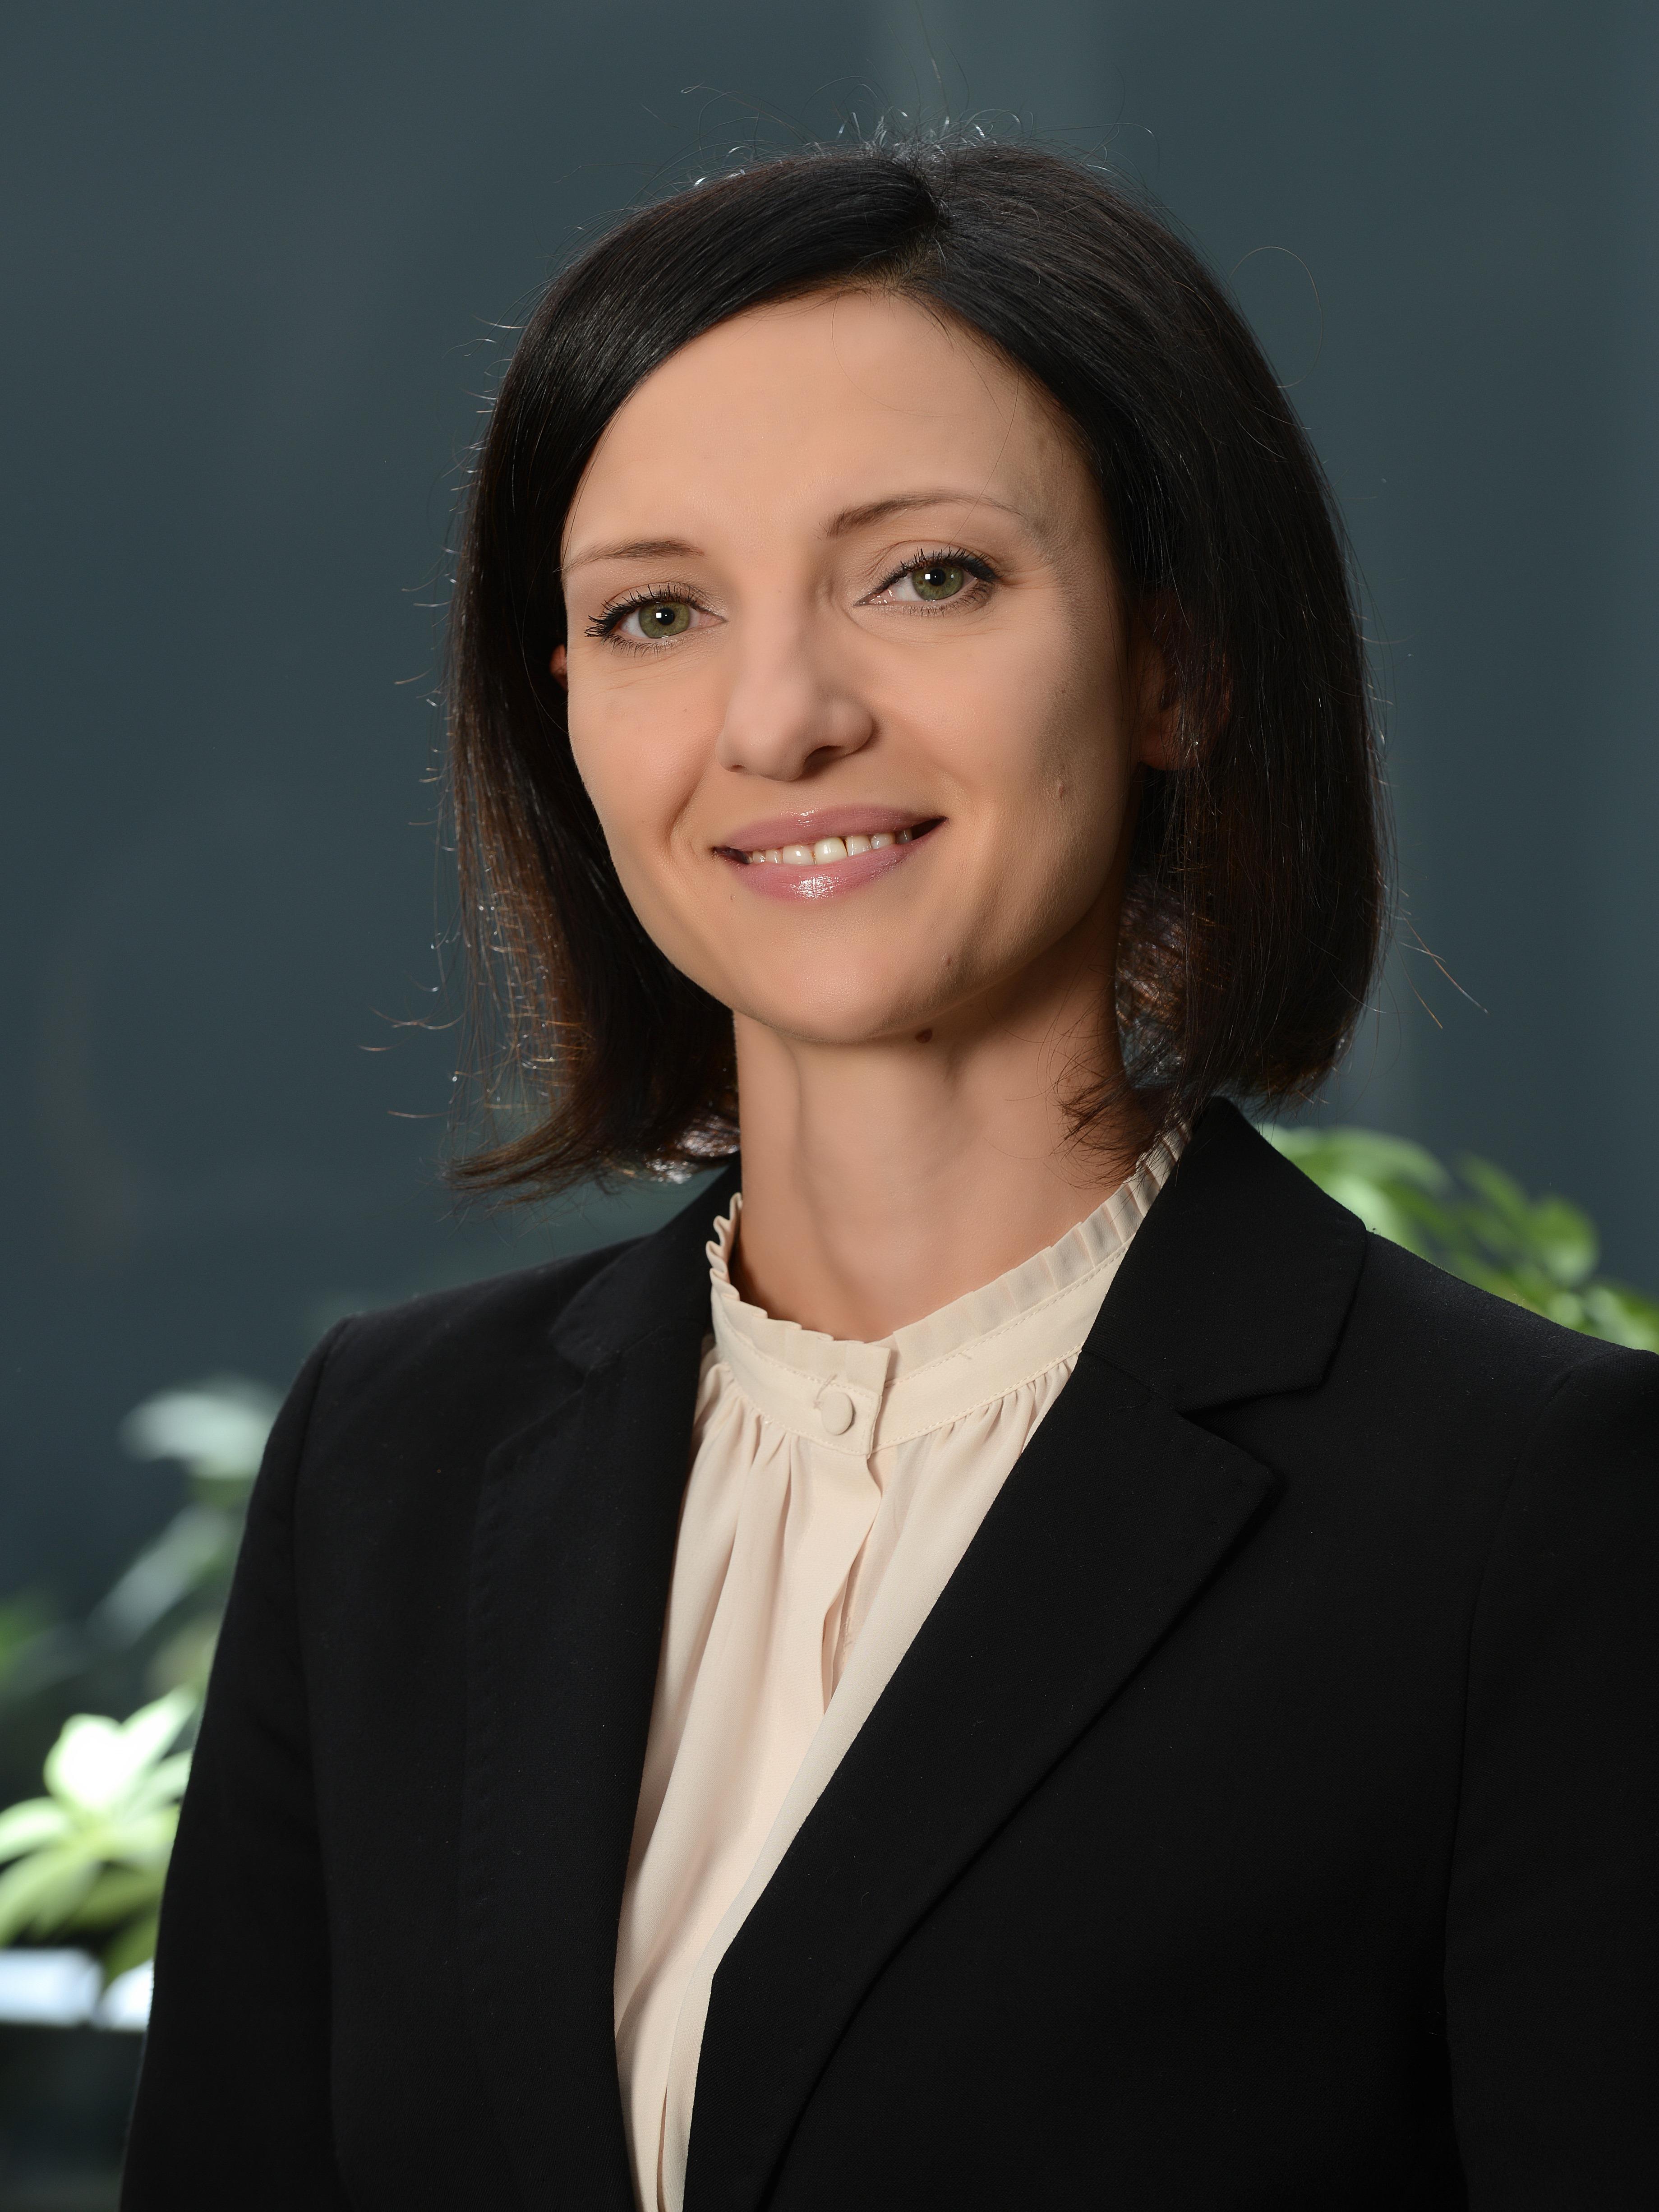 Svetlana Fico